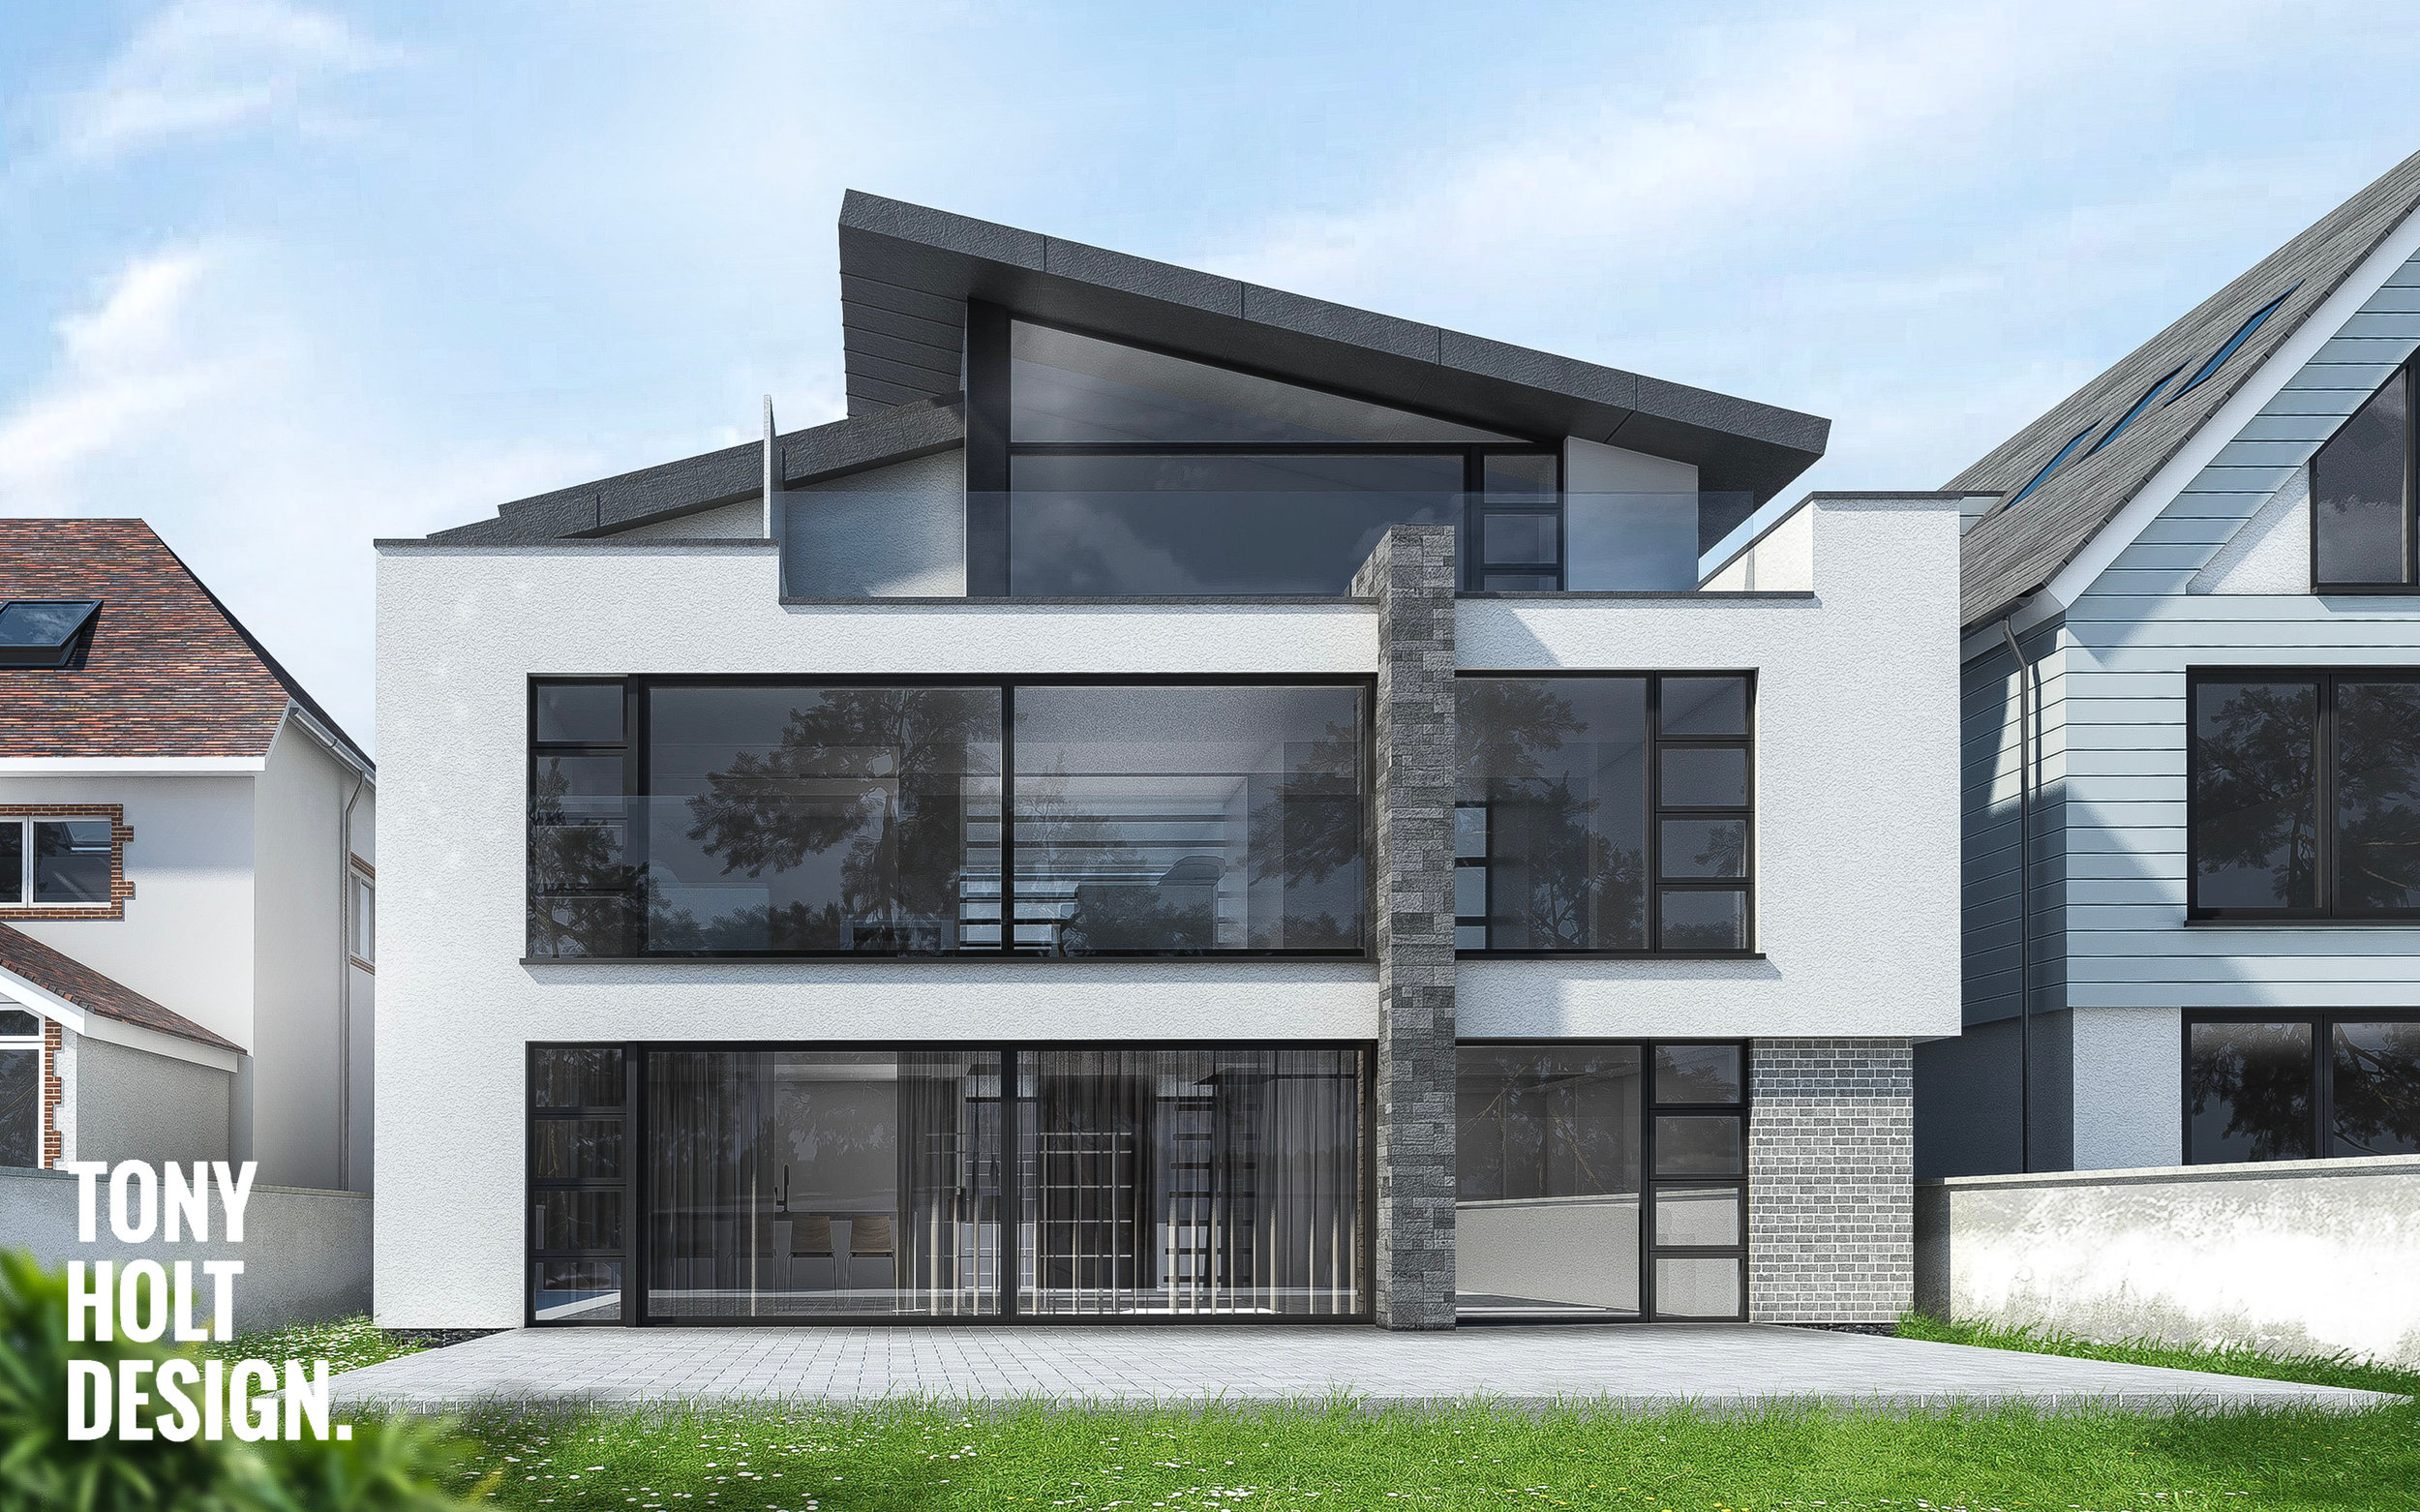 Tony_Holt_Design_Orchard_Avenue_New_Build_02.jpg